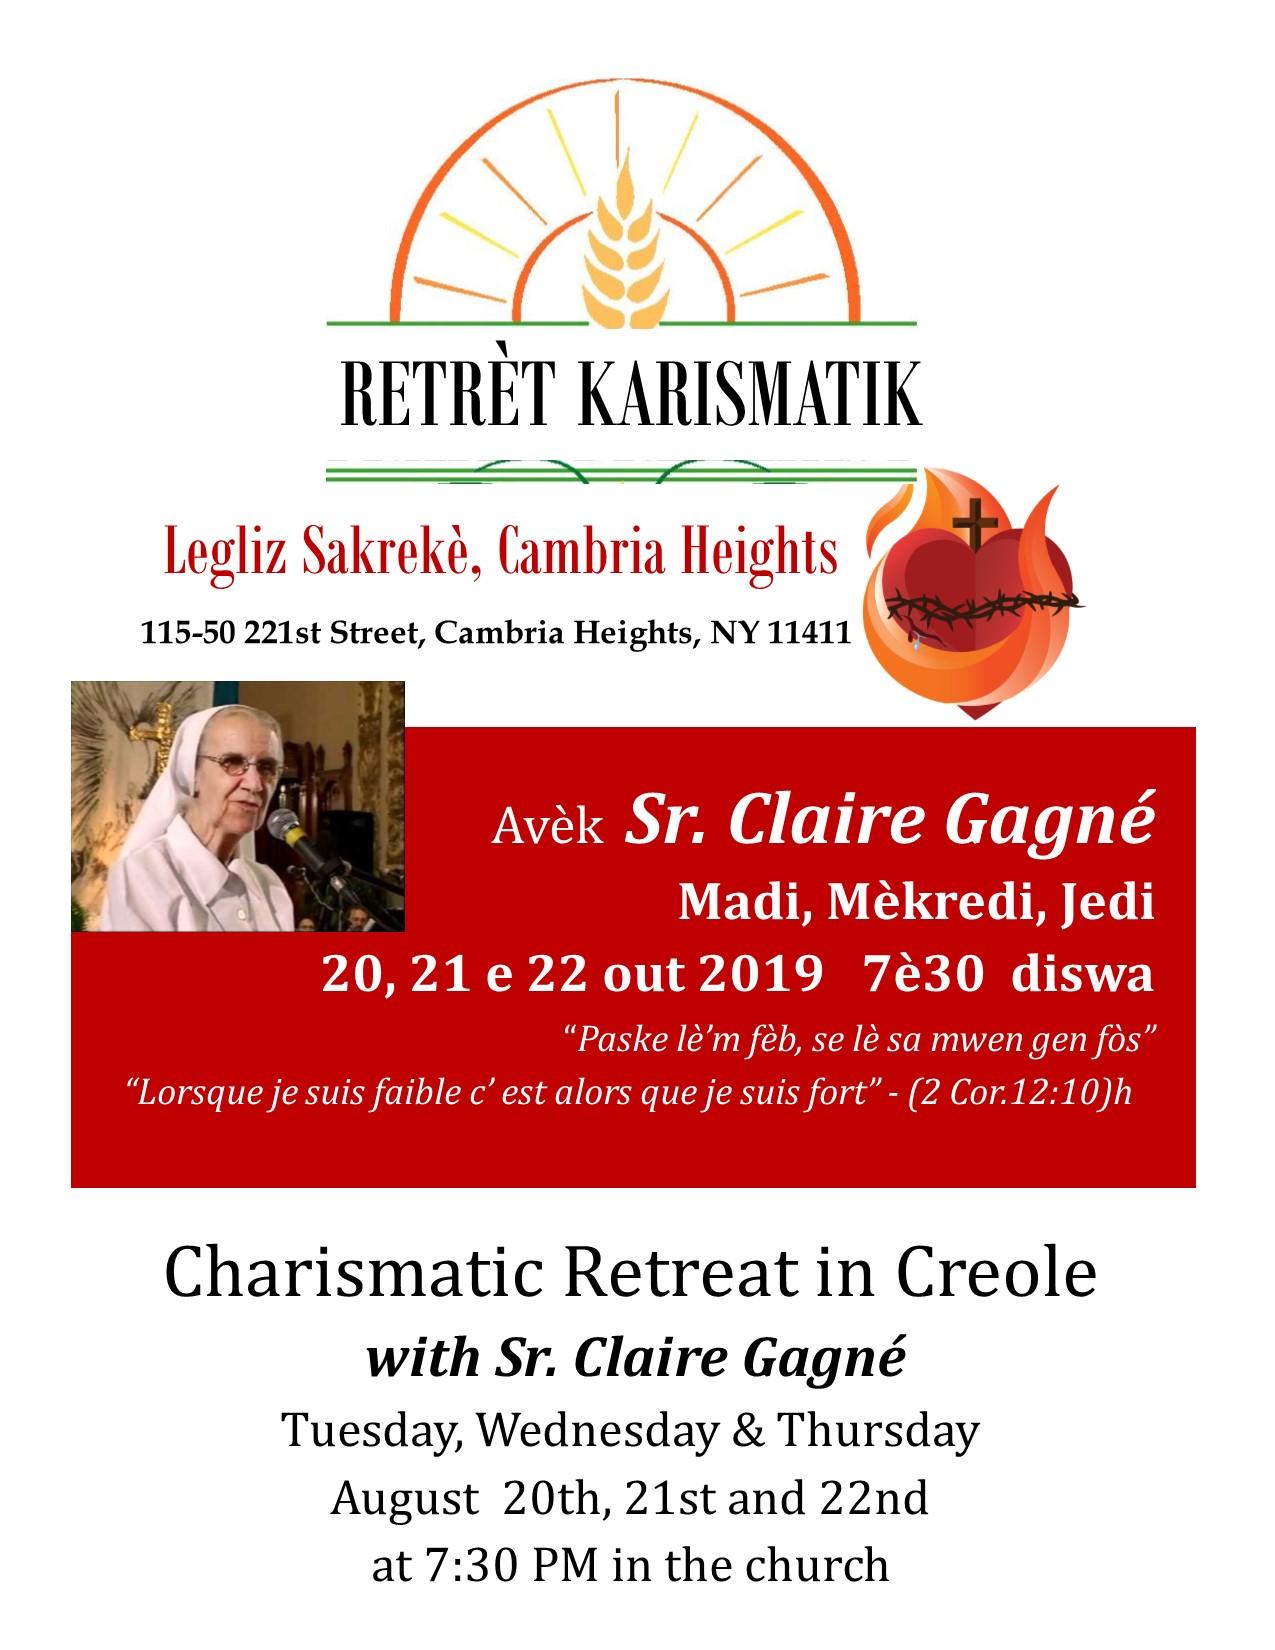 Creole_Charasmatic_Retreat.jpg